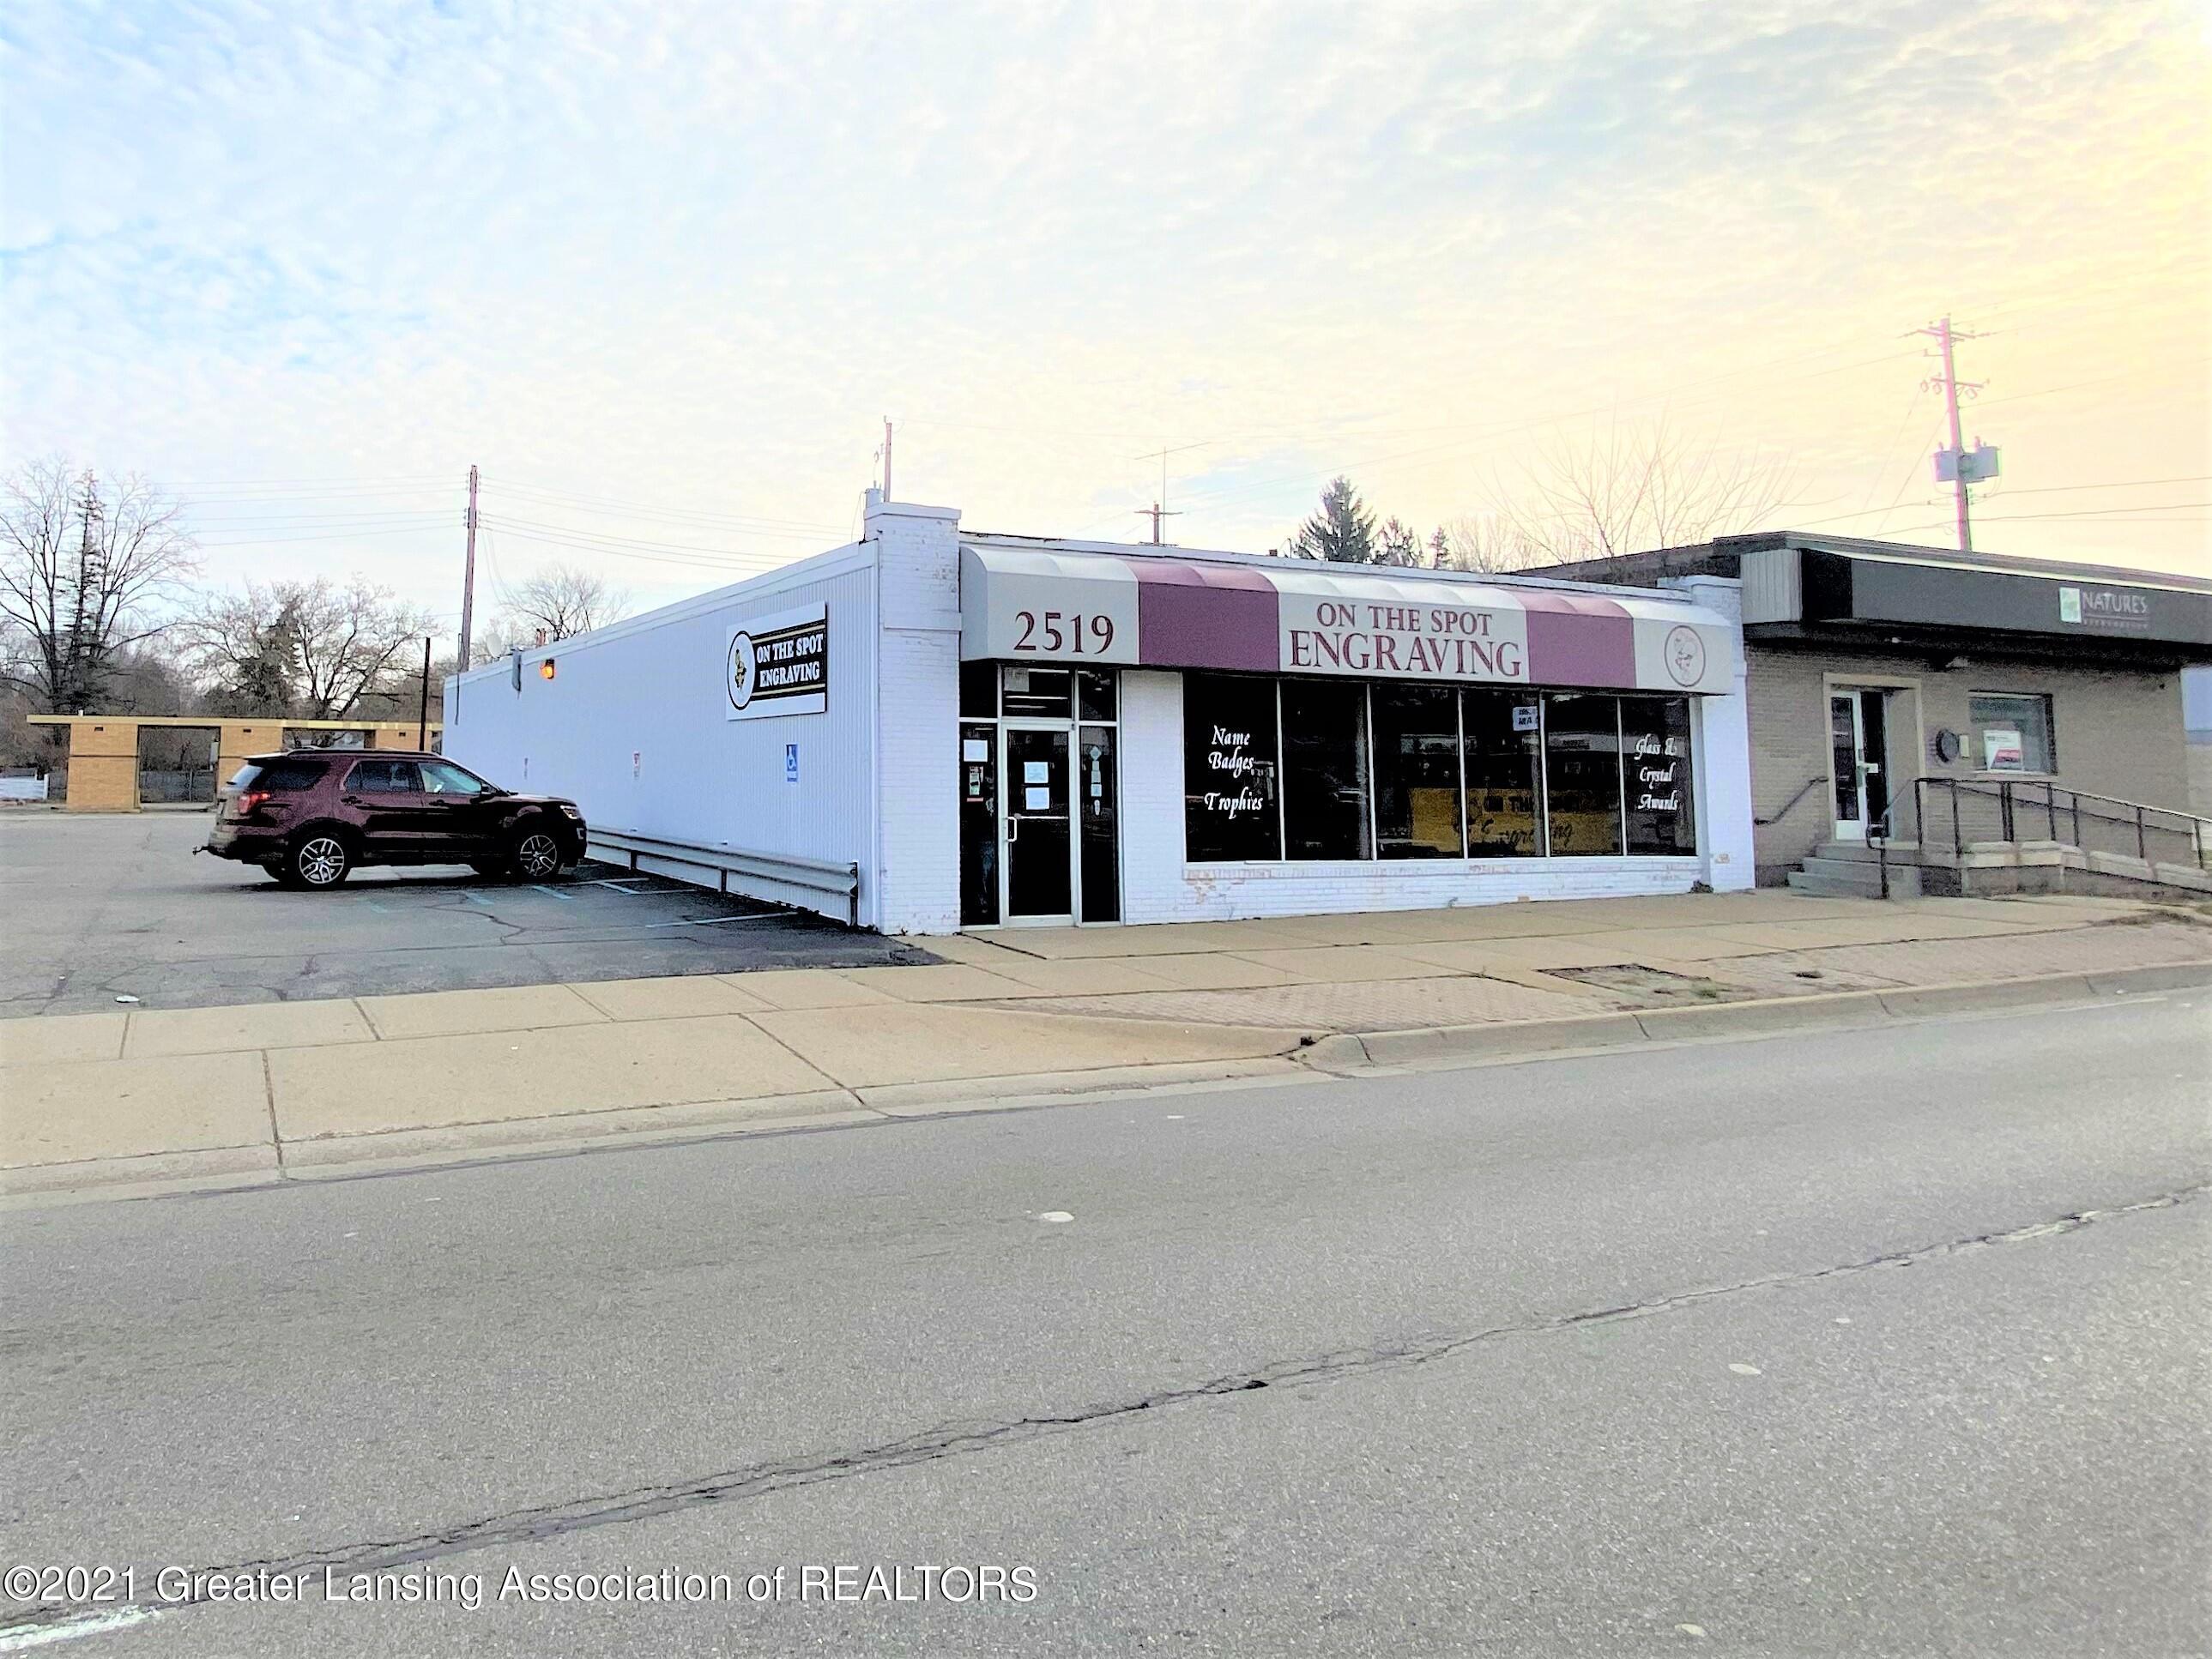 2519 S Cedar St - Front/Side View - 1